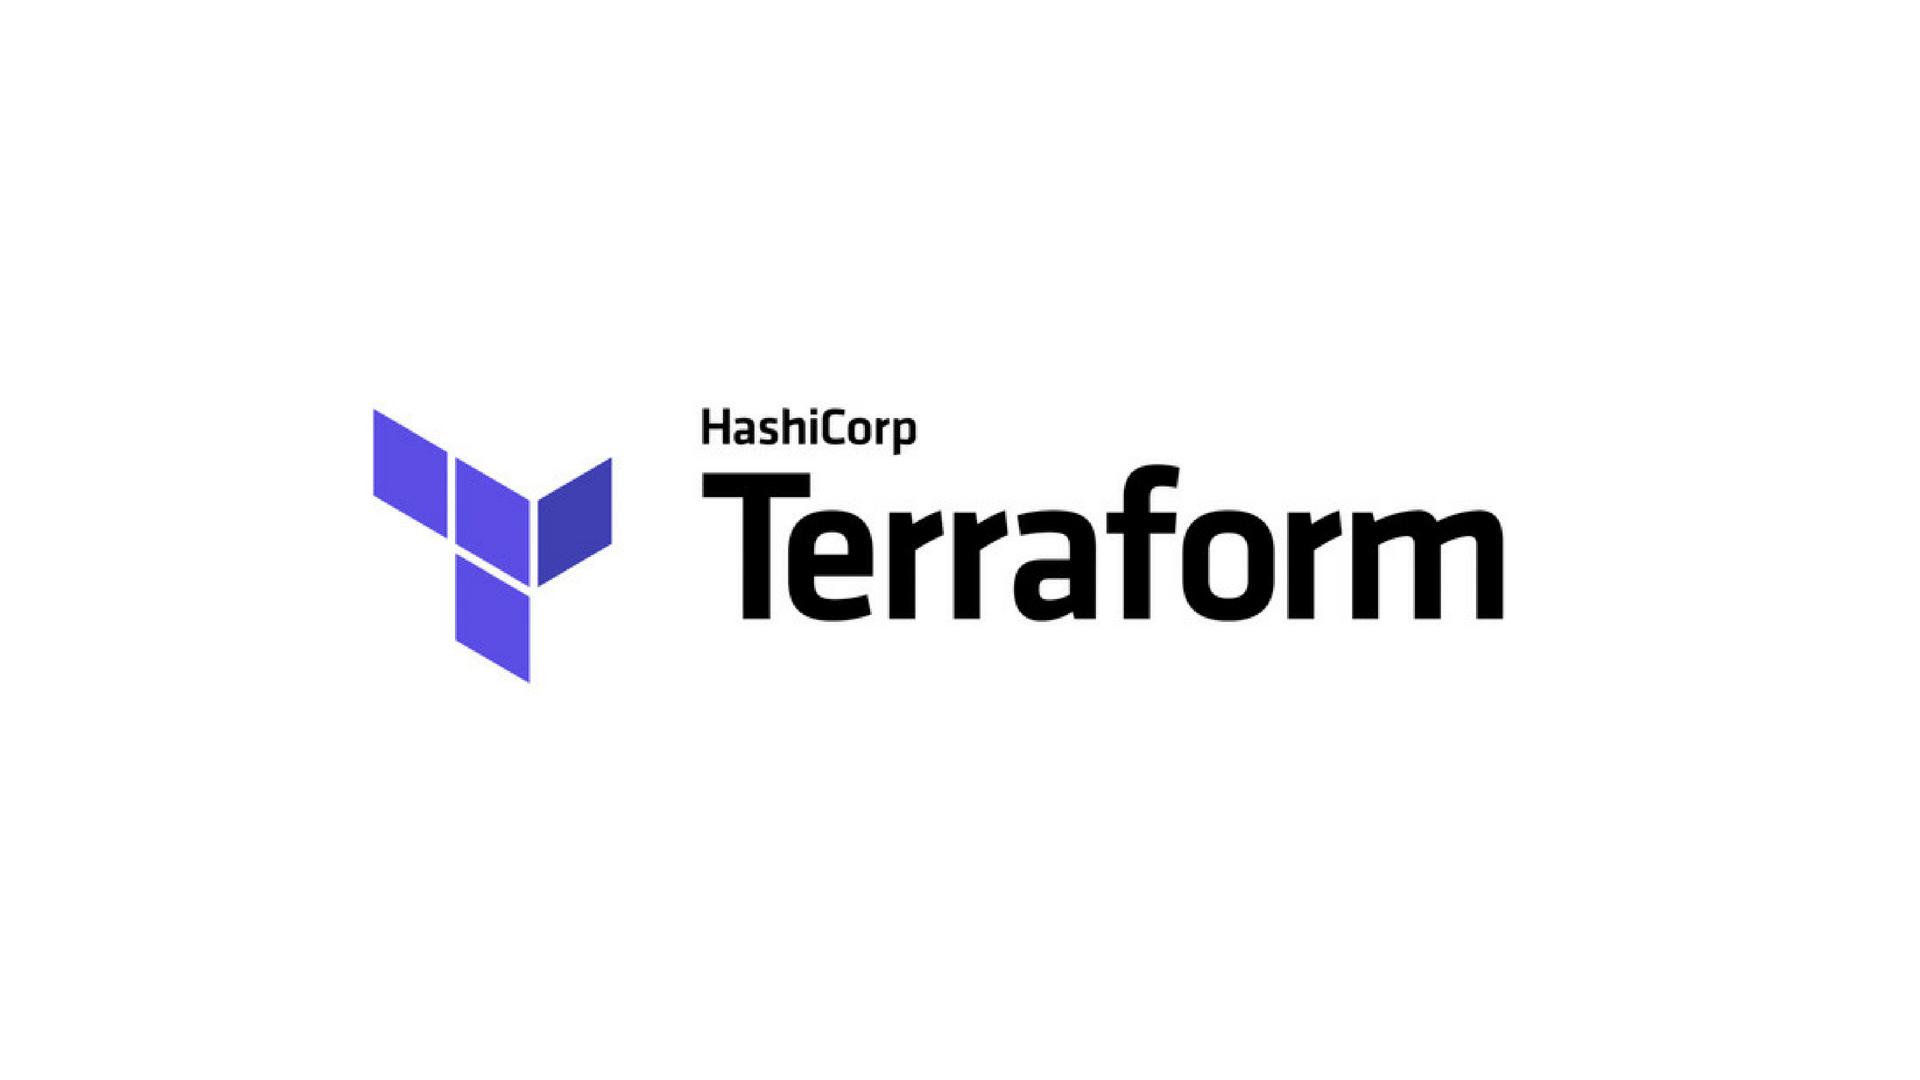 HashiCorp-Terraform-logo